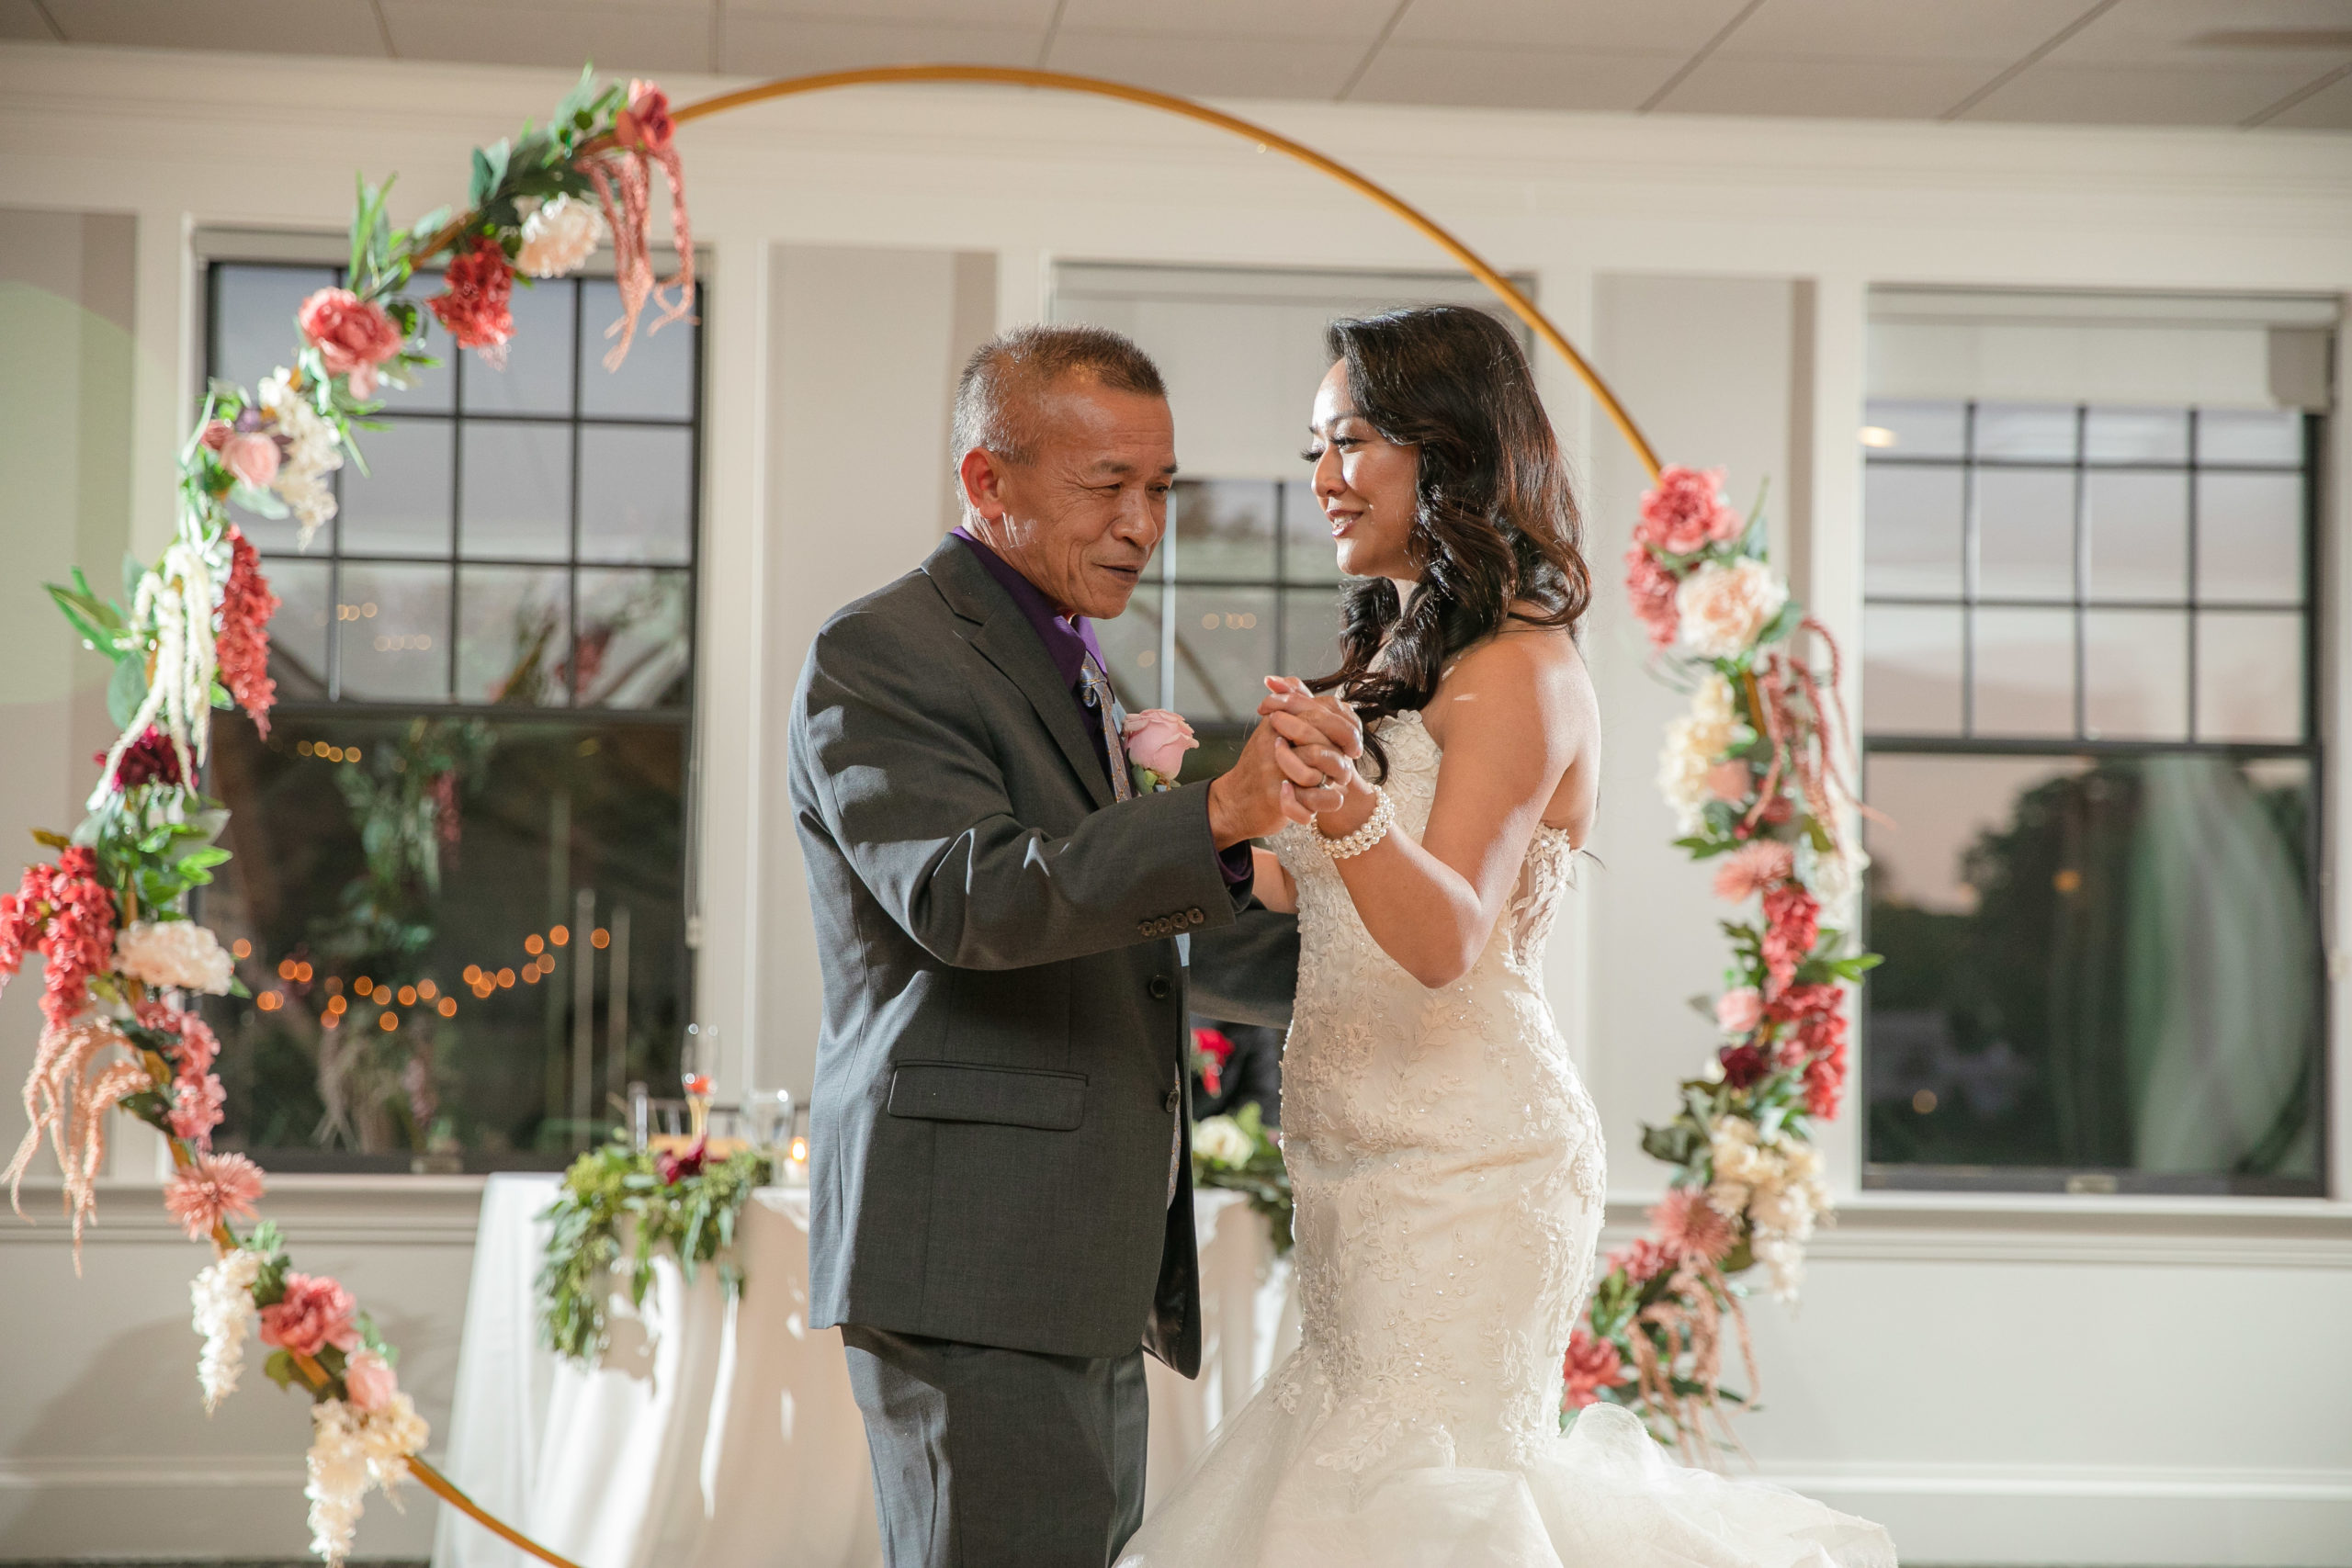 Harbor lights, warwick, rhode island, RI, Tracy Jenkins Photography, RI wedding photographer, Rhode Island wedding photographer, micro-wedding, father daughter dance, reception